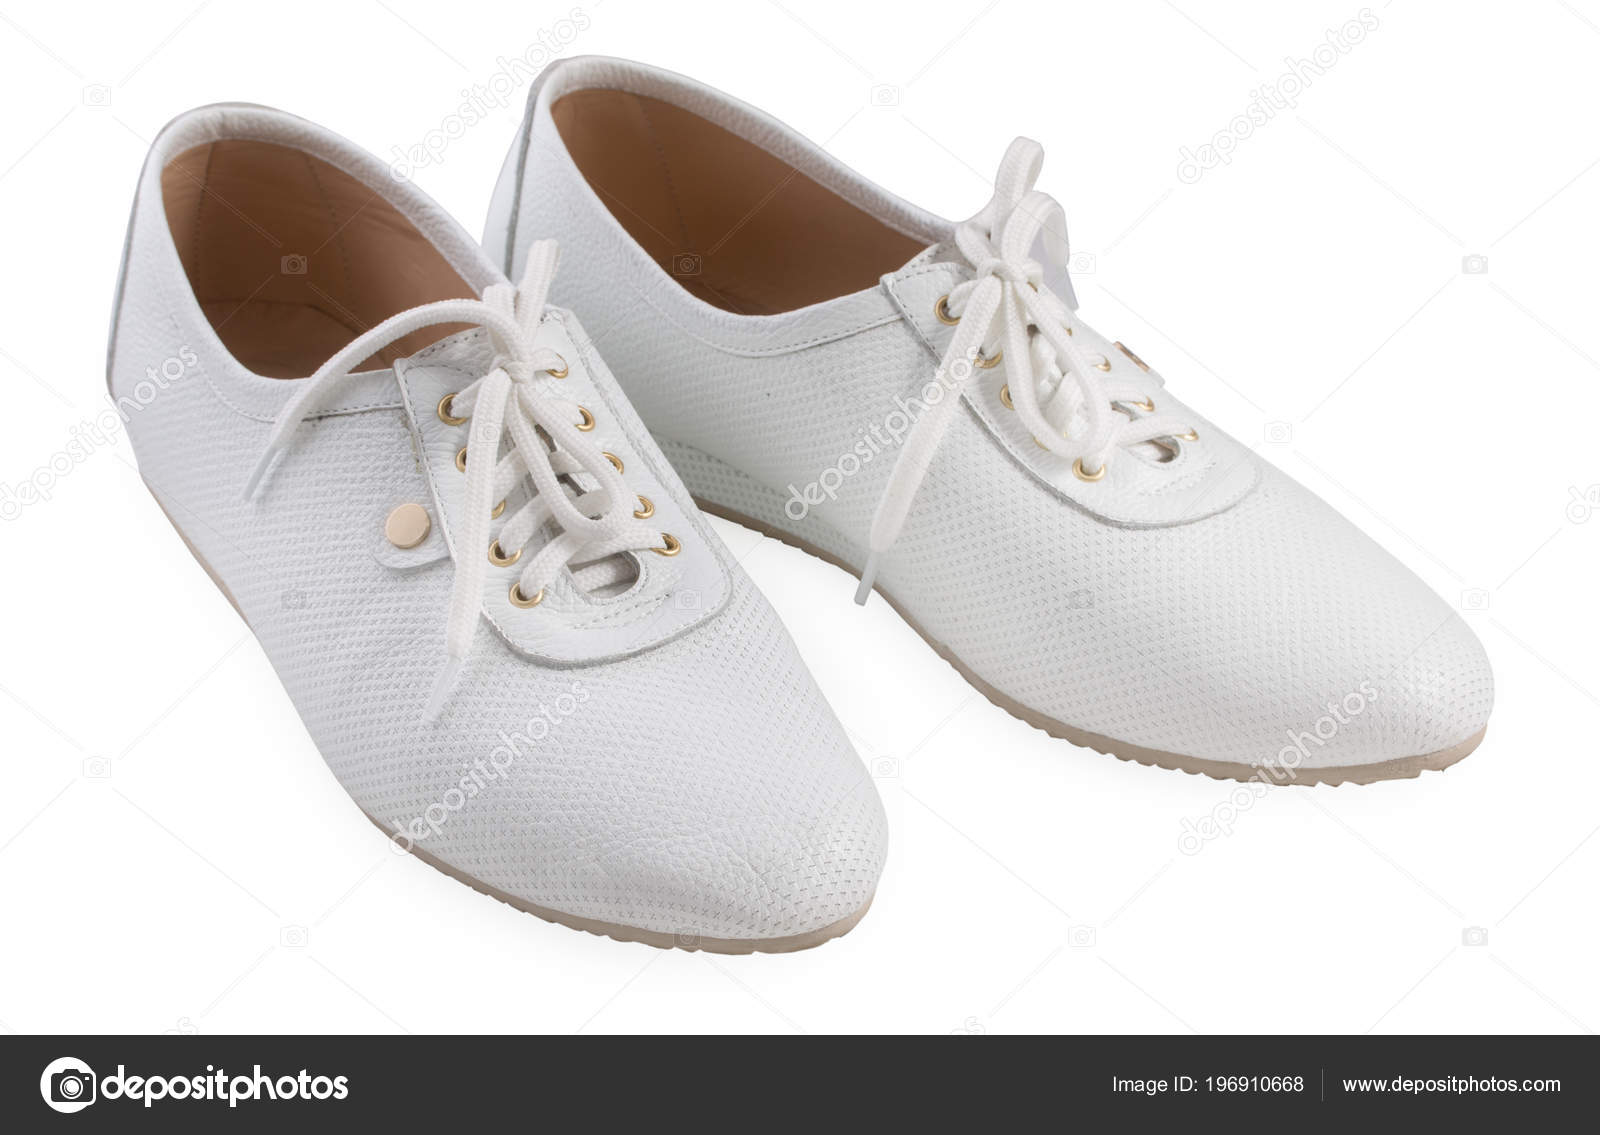 acd049d8d45 Ζευγάρι Γυναικεία Αθλητικά Παπούτσια Απομονωθεί Λευκό Φόντο ...